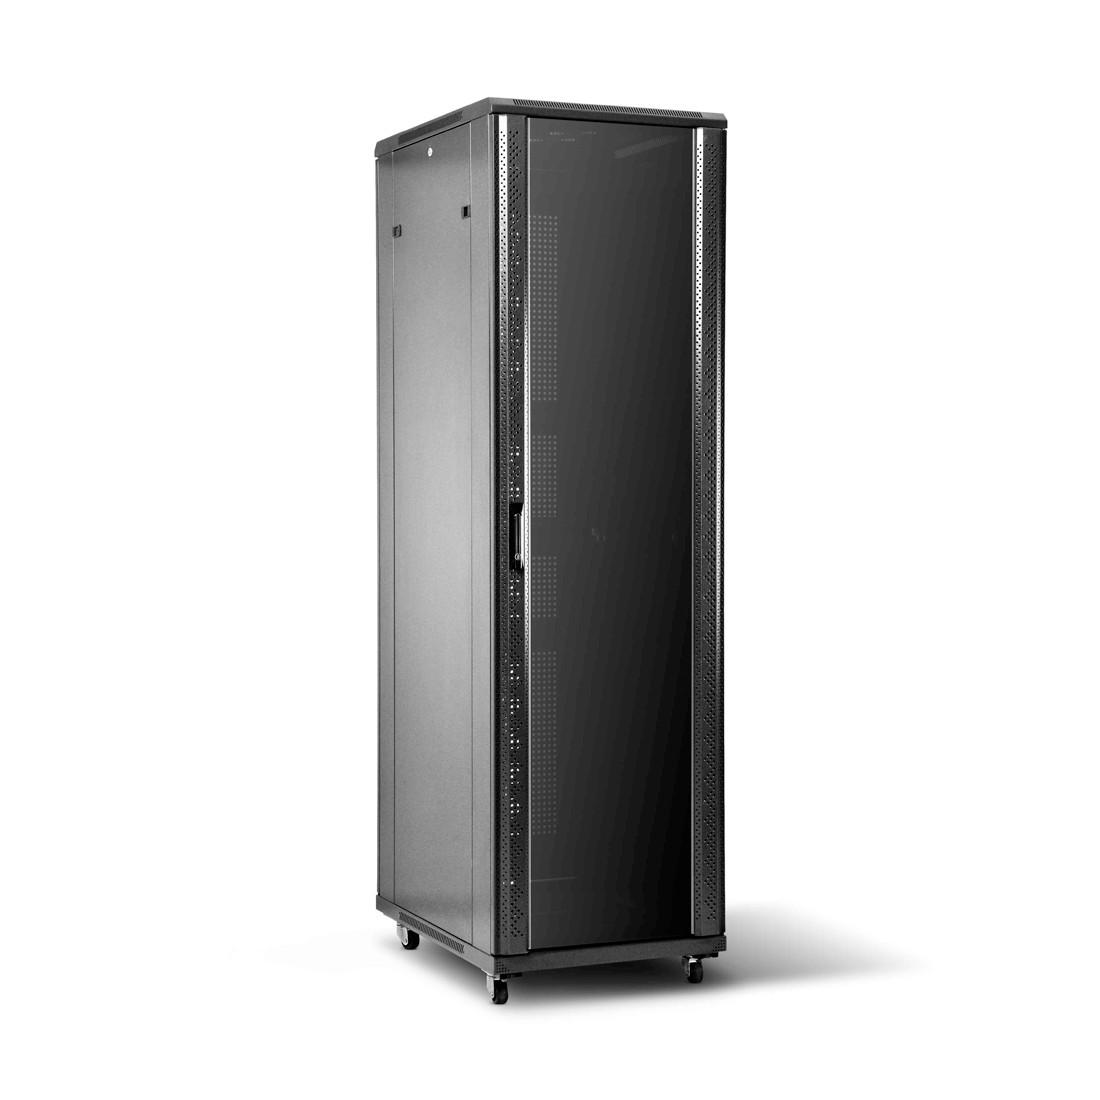 Шкаф серверный SHIP 601S.8842.24.100 42U 800*800*2000 мм